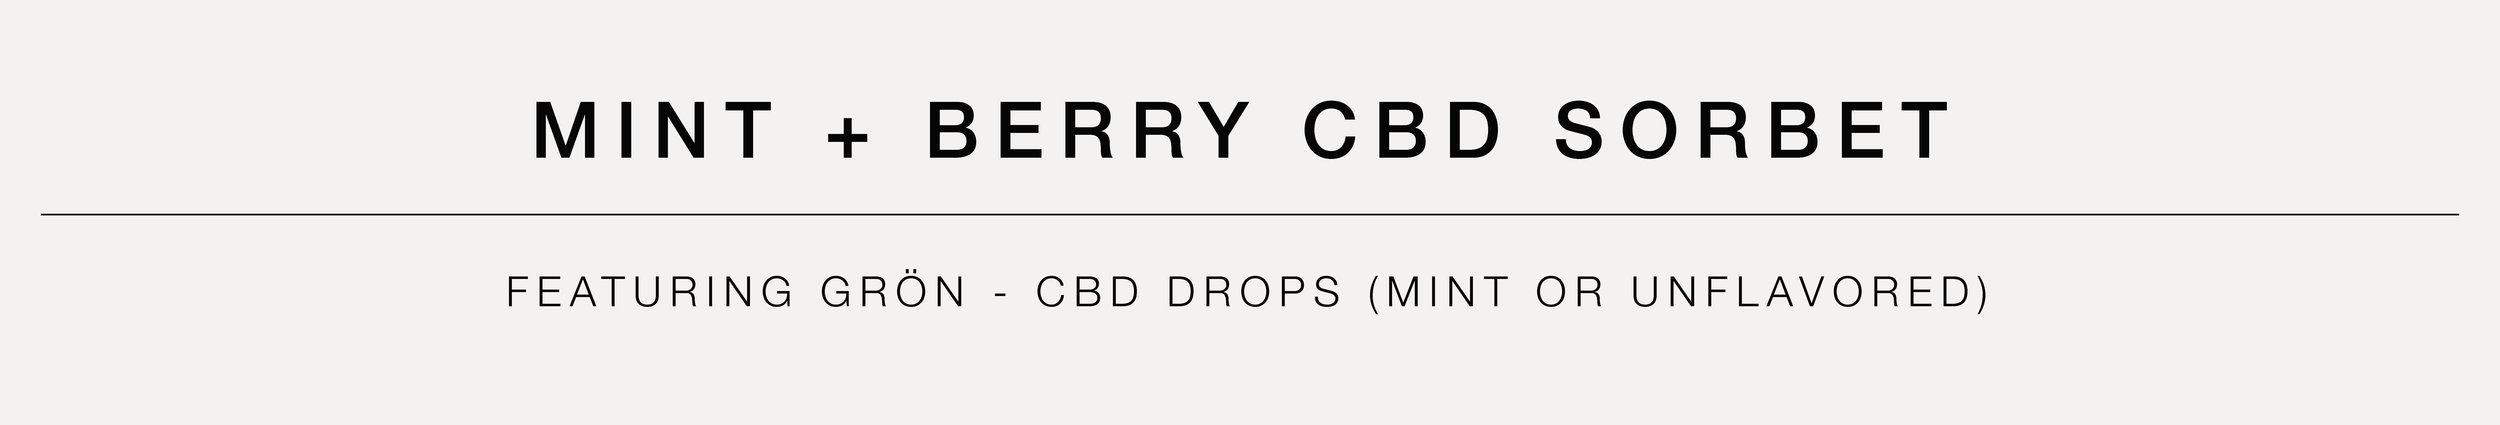 MINT + BERRY CBD SORBET BANNER.jpg